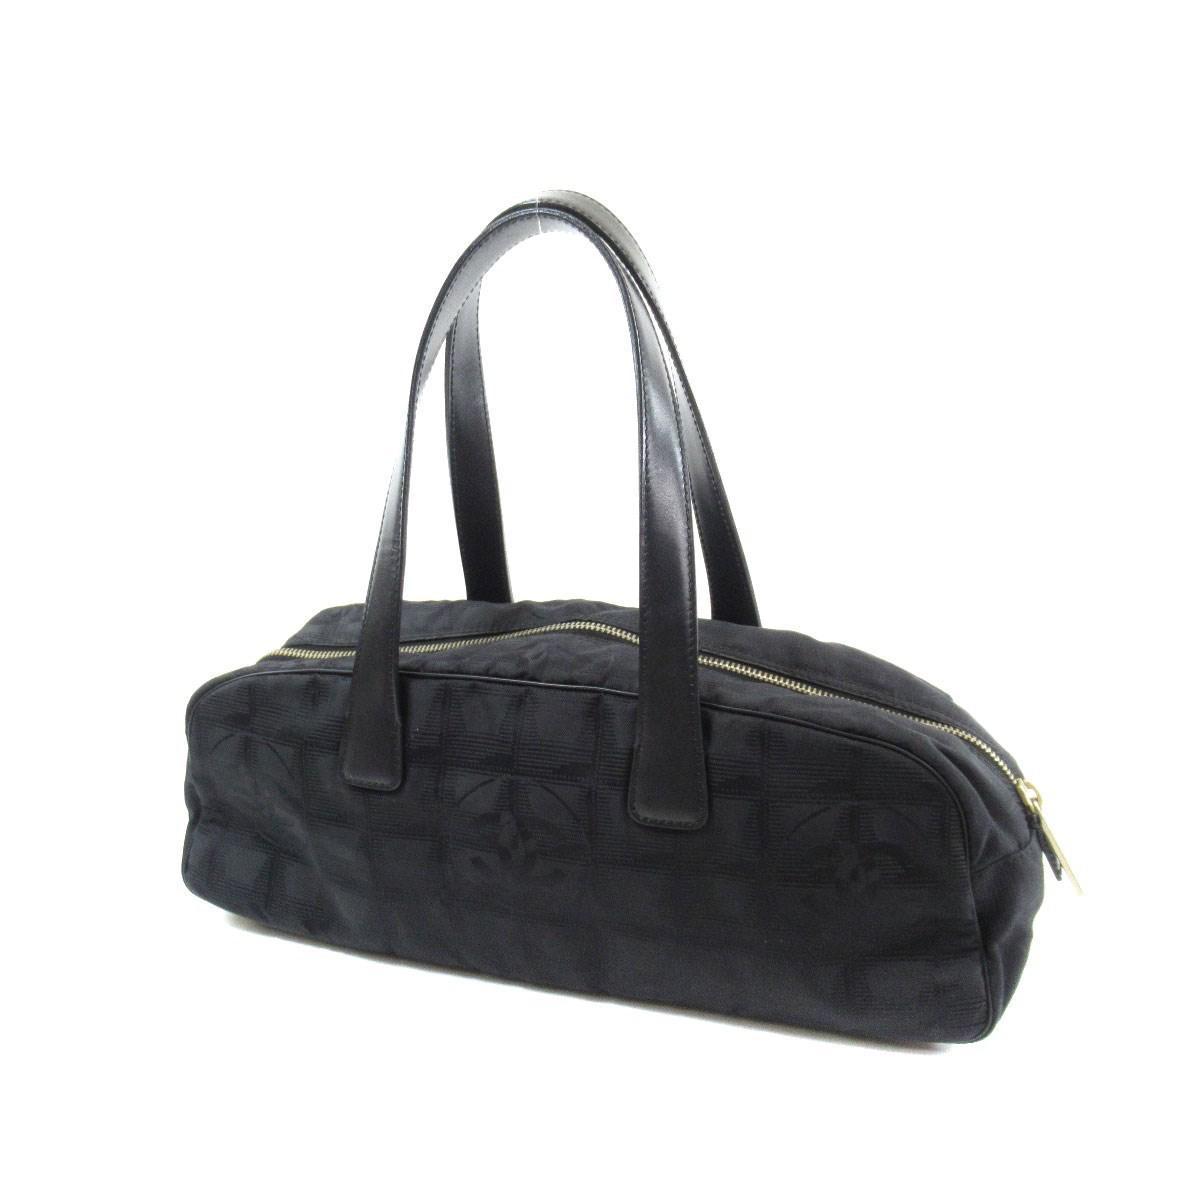 624de3315346 Lyst - Chanel Nylon Jacquard Handbag New Travel Line in Black